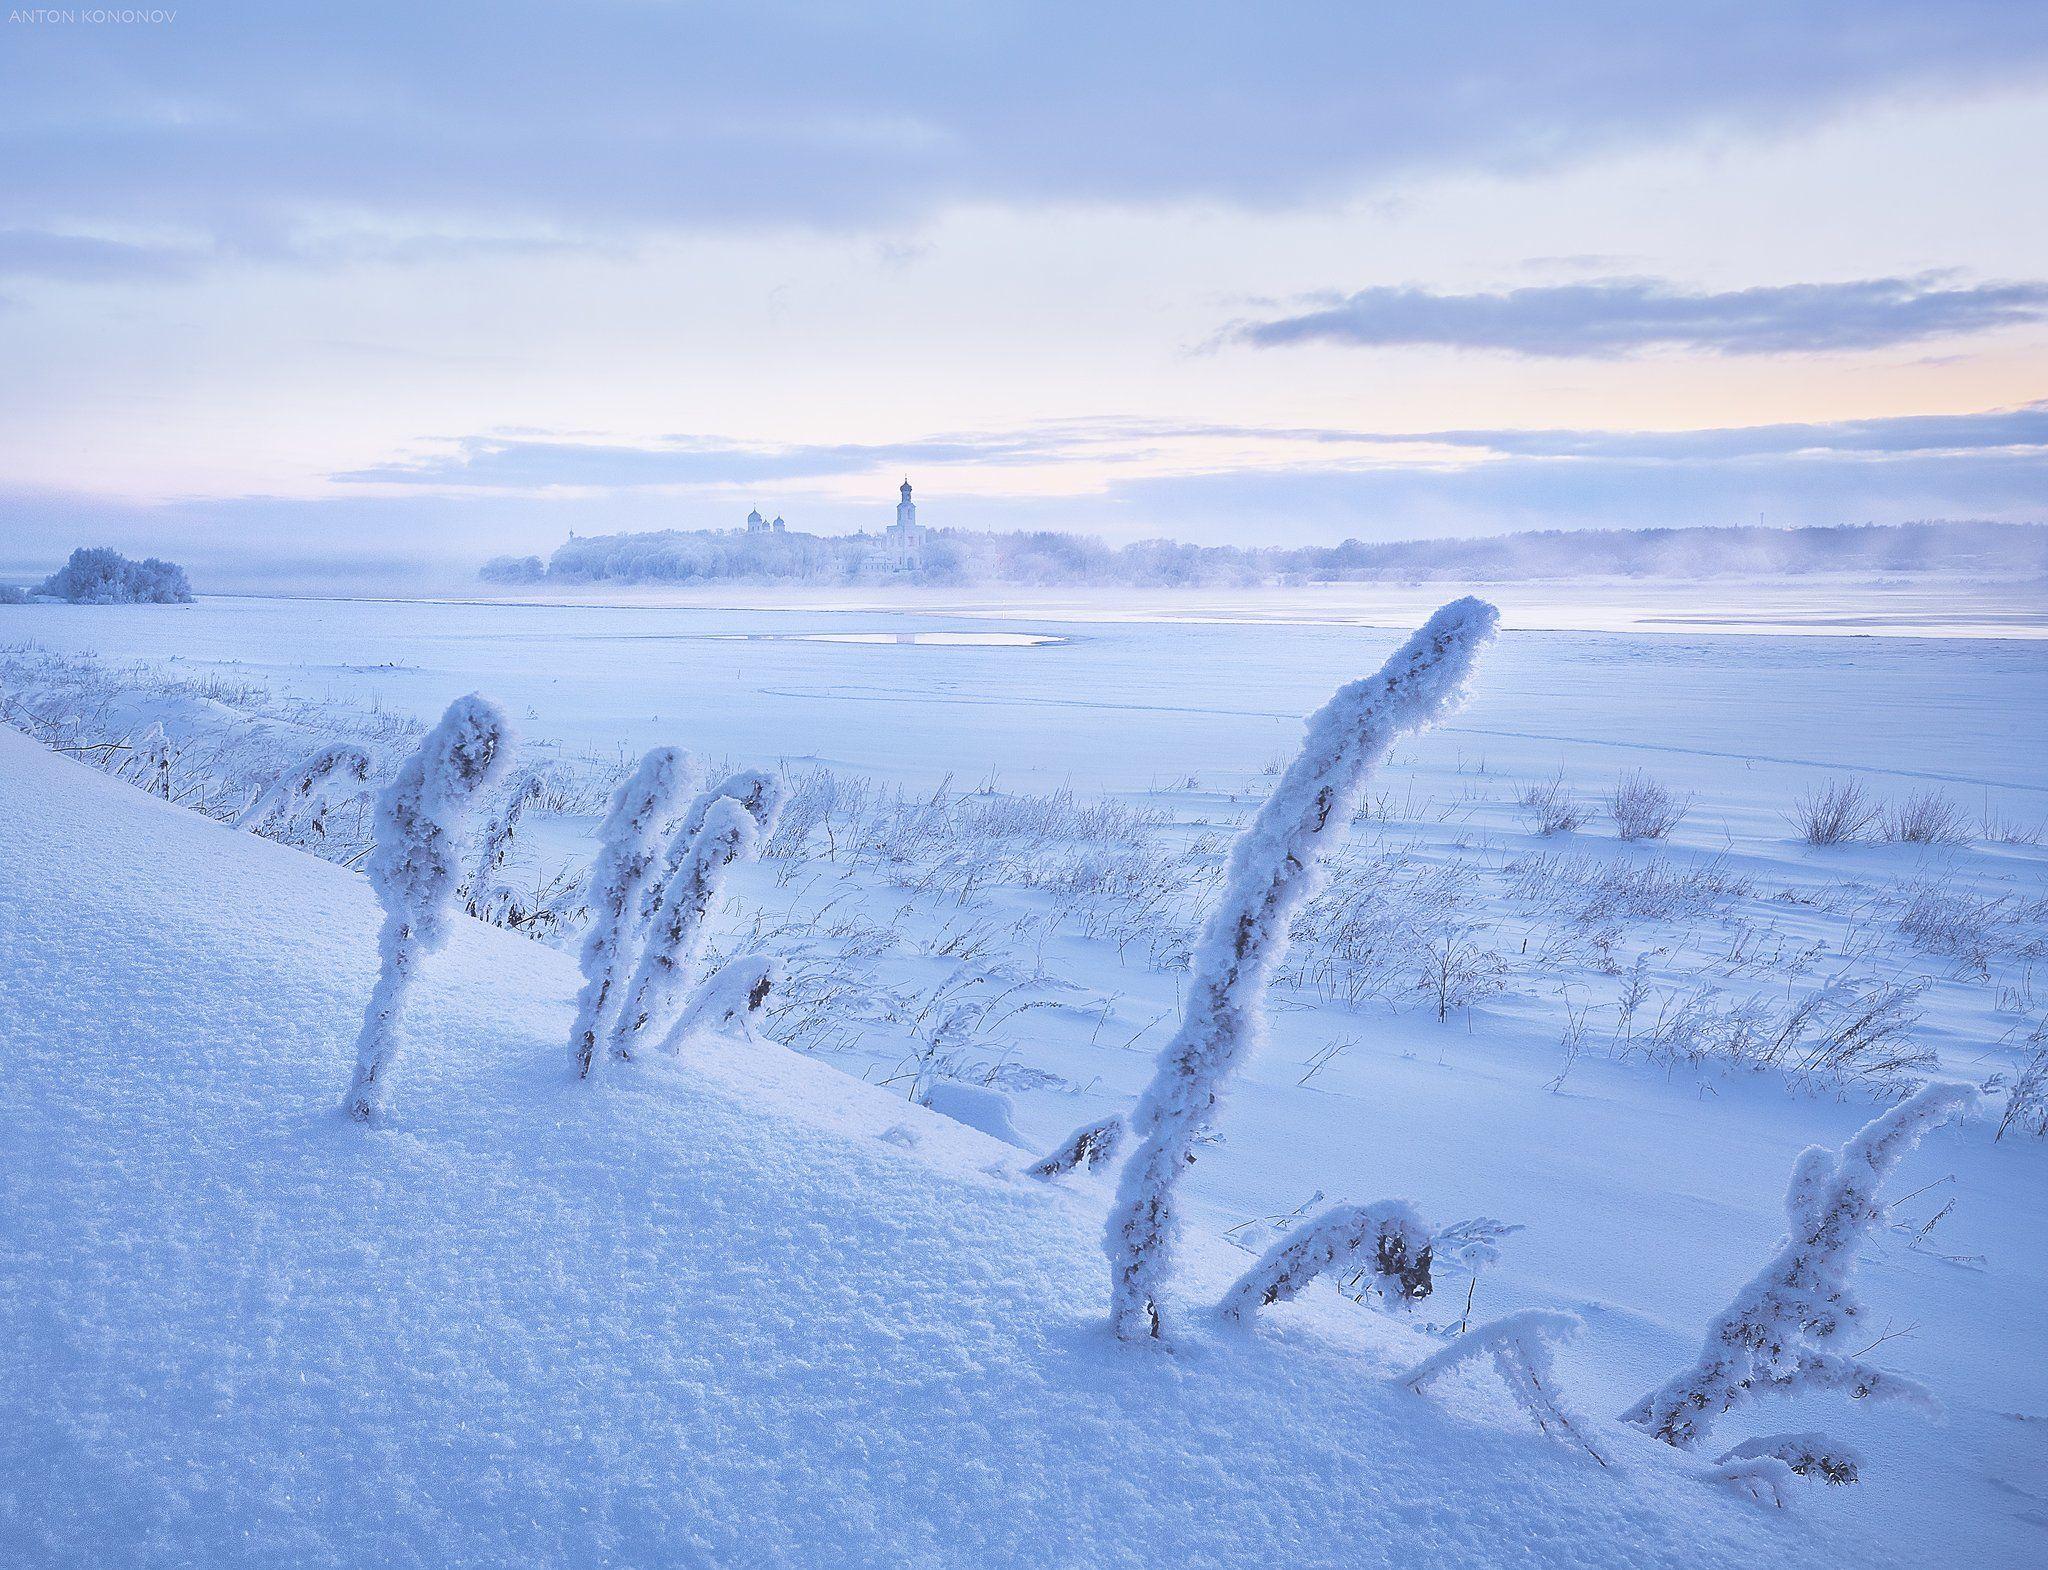 Юрьев Монастырь, зима, снег, туман, Кононов Антон